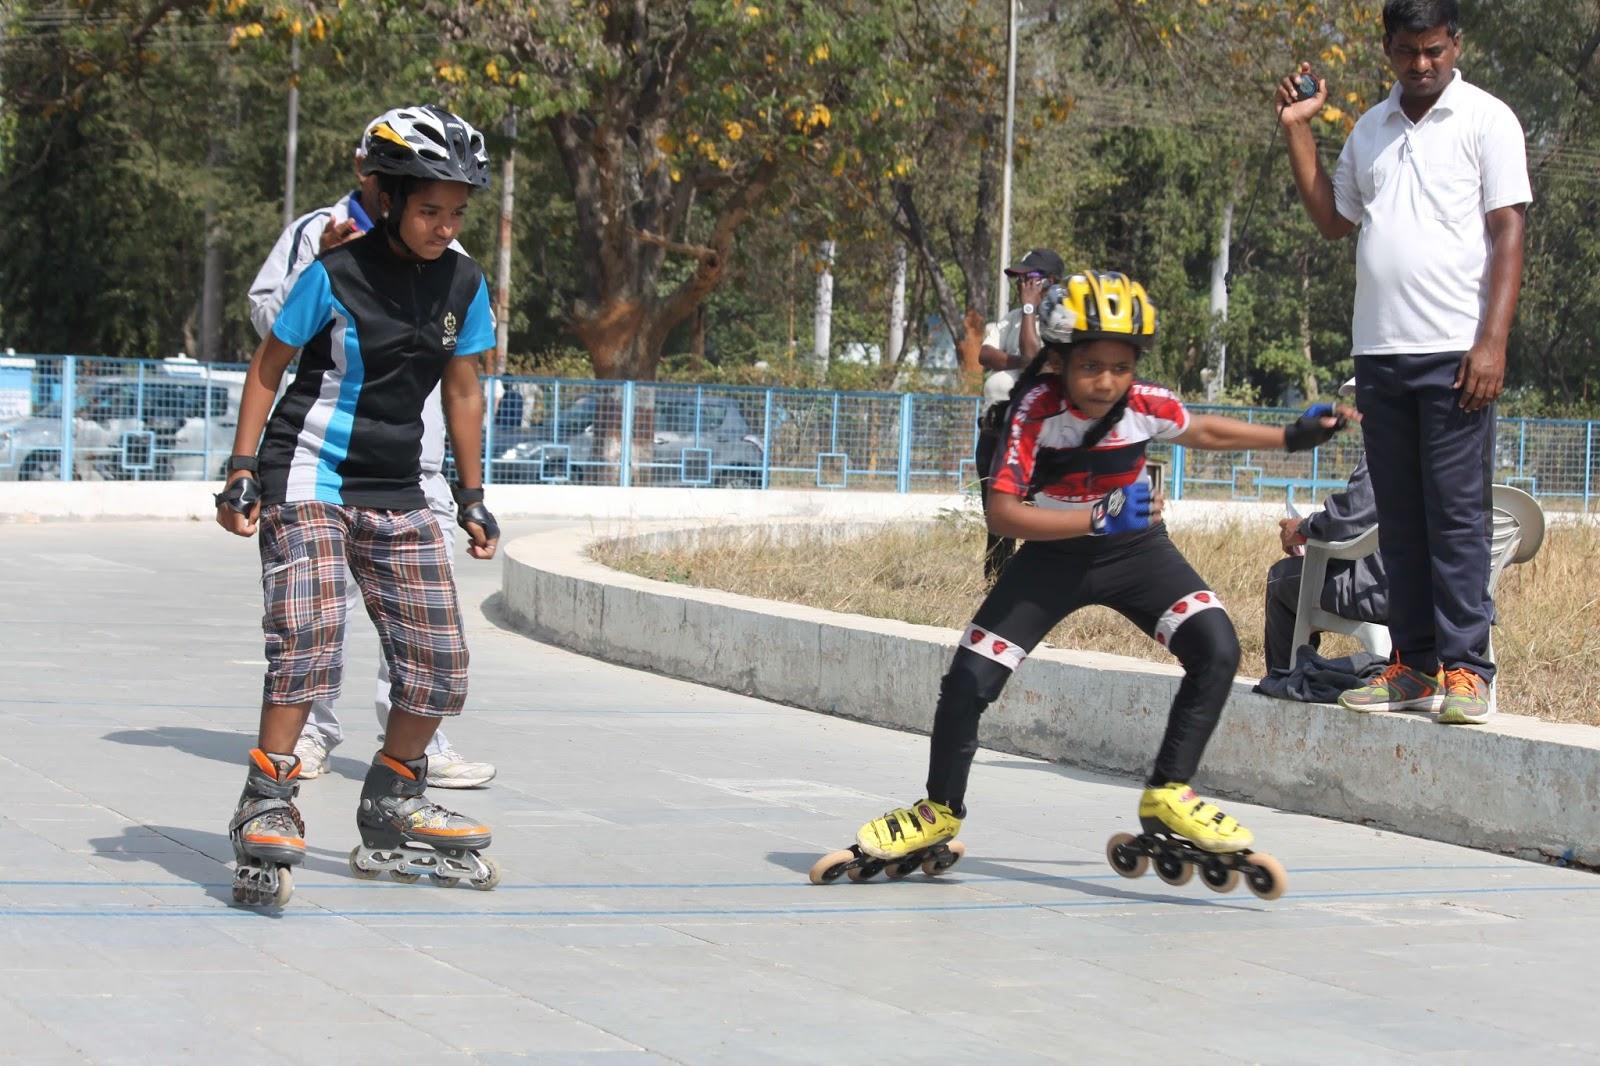 skating classes at jubilee hills in hyderabad roller skate wheels buy inline skates kids adjustable roller skates buy skateboard